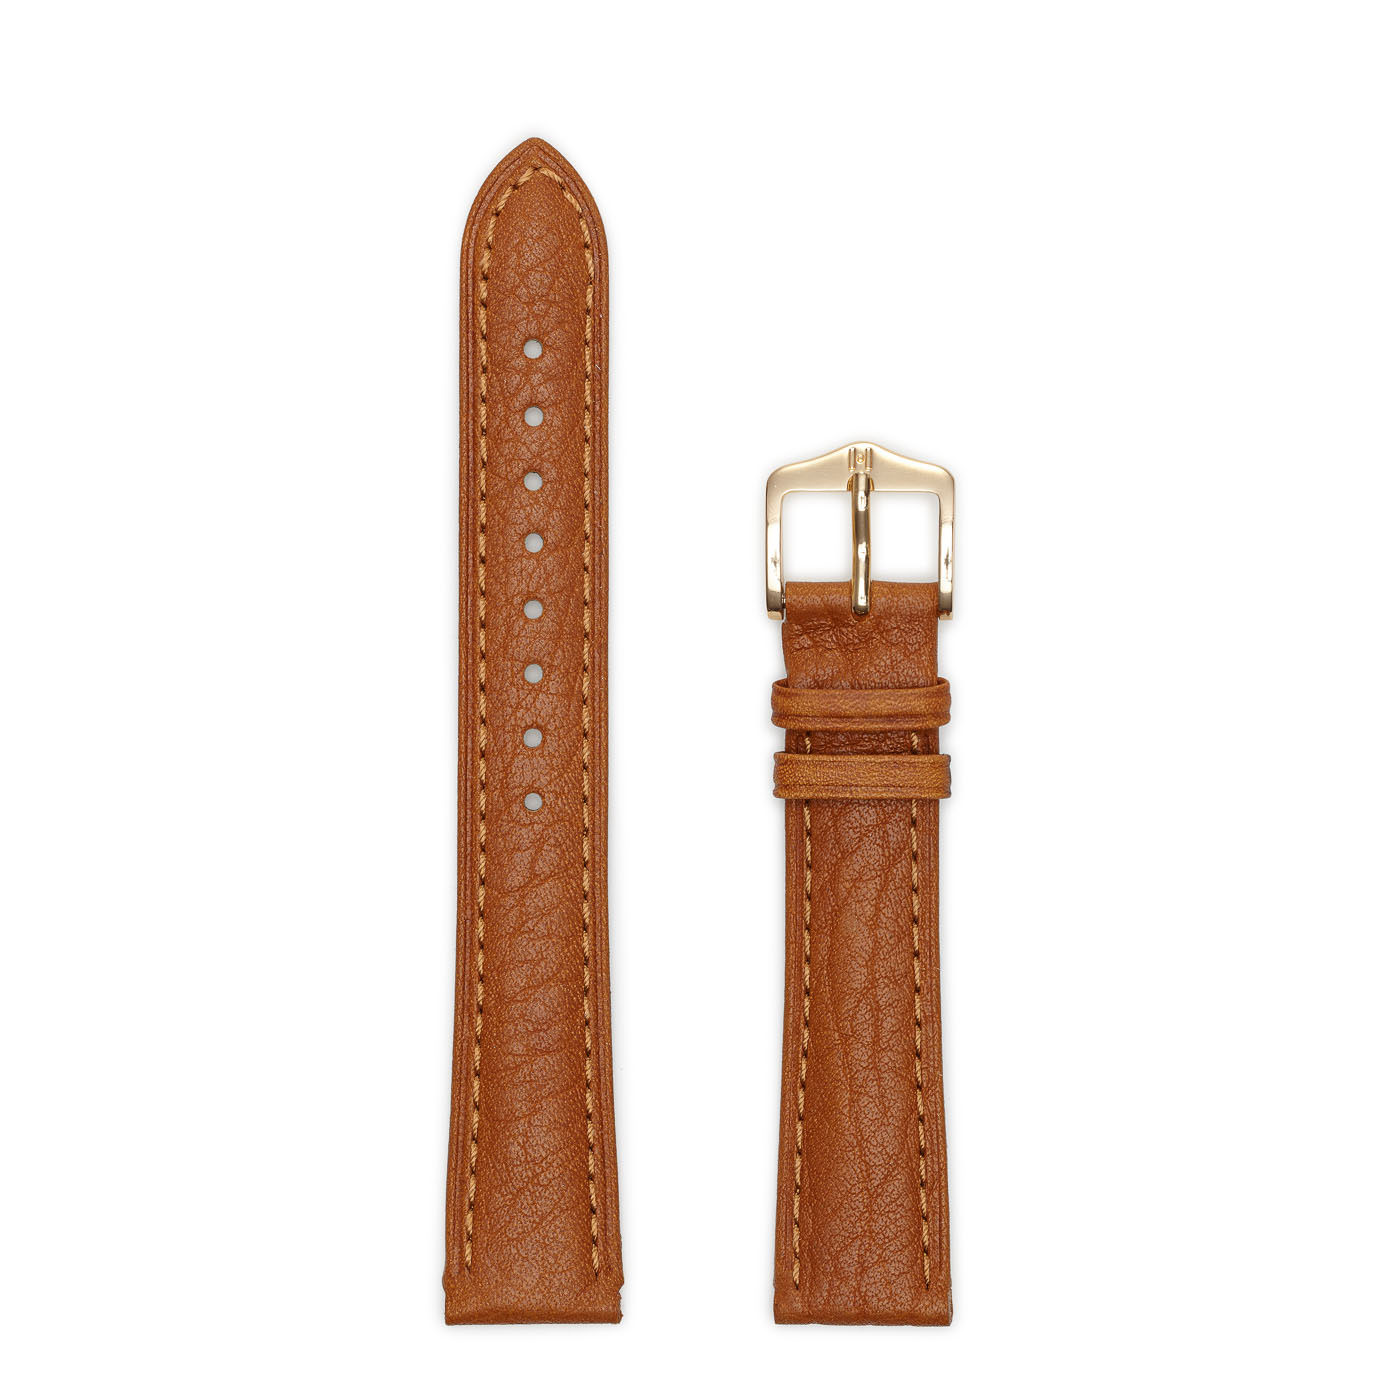 Hirsch Strap Camelgrain Pro Skin M 01009110-1 (Bandbreedte: 8-16 mm)